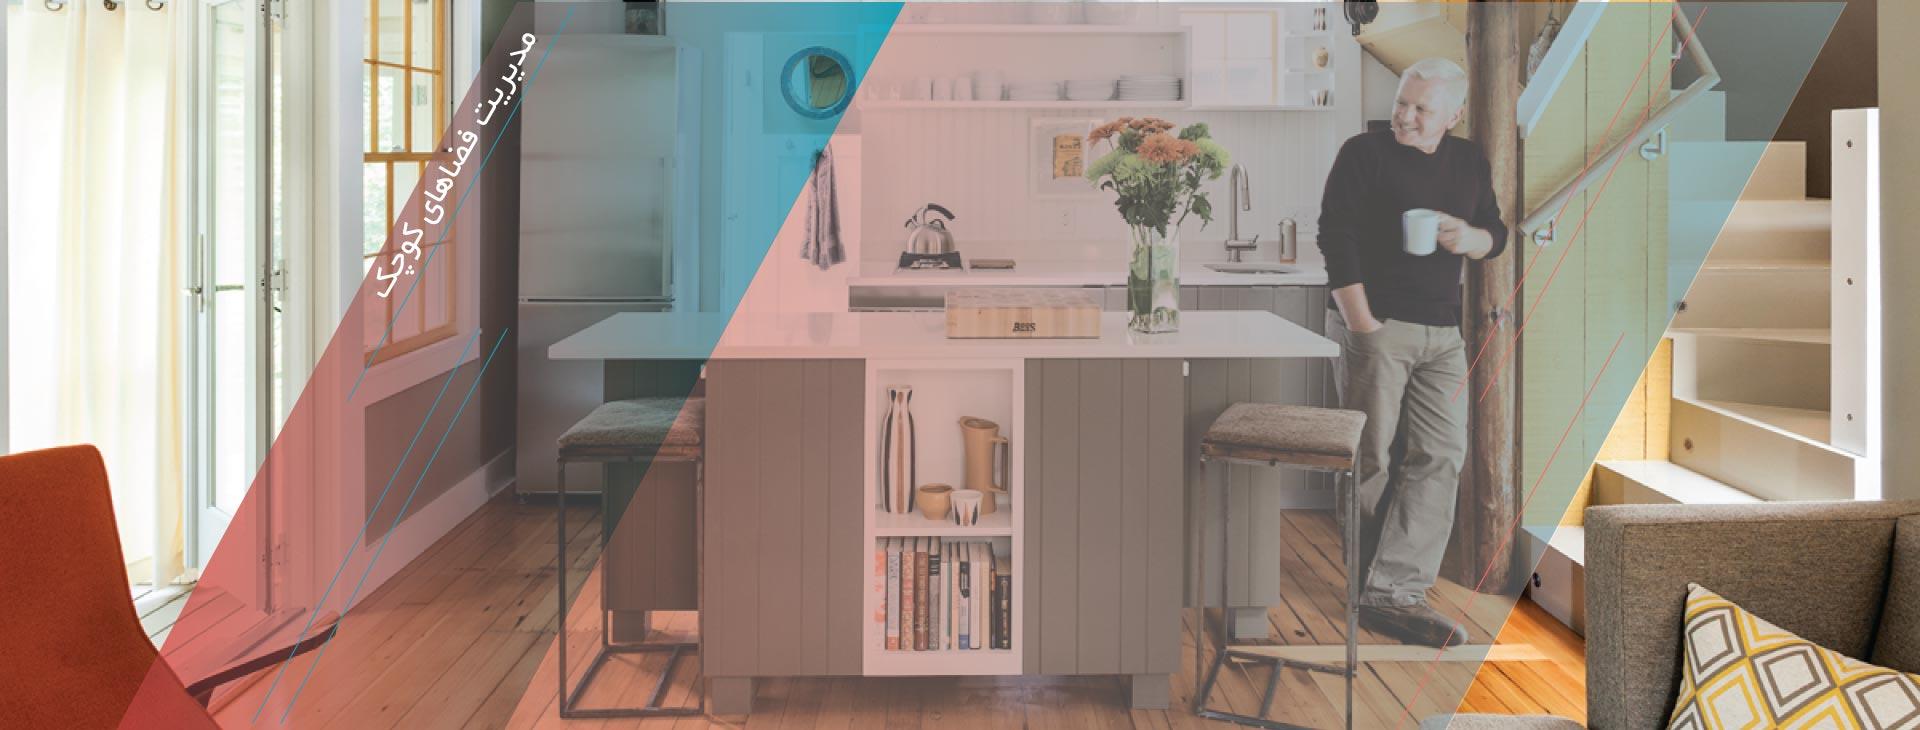 interior design for small spaces - ایده مدیریت فضاهای کوچک